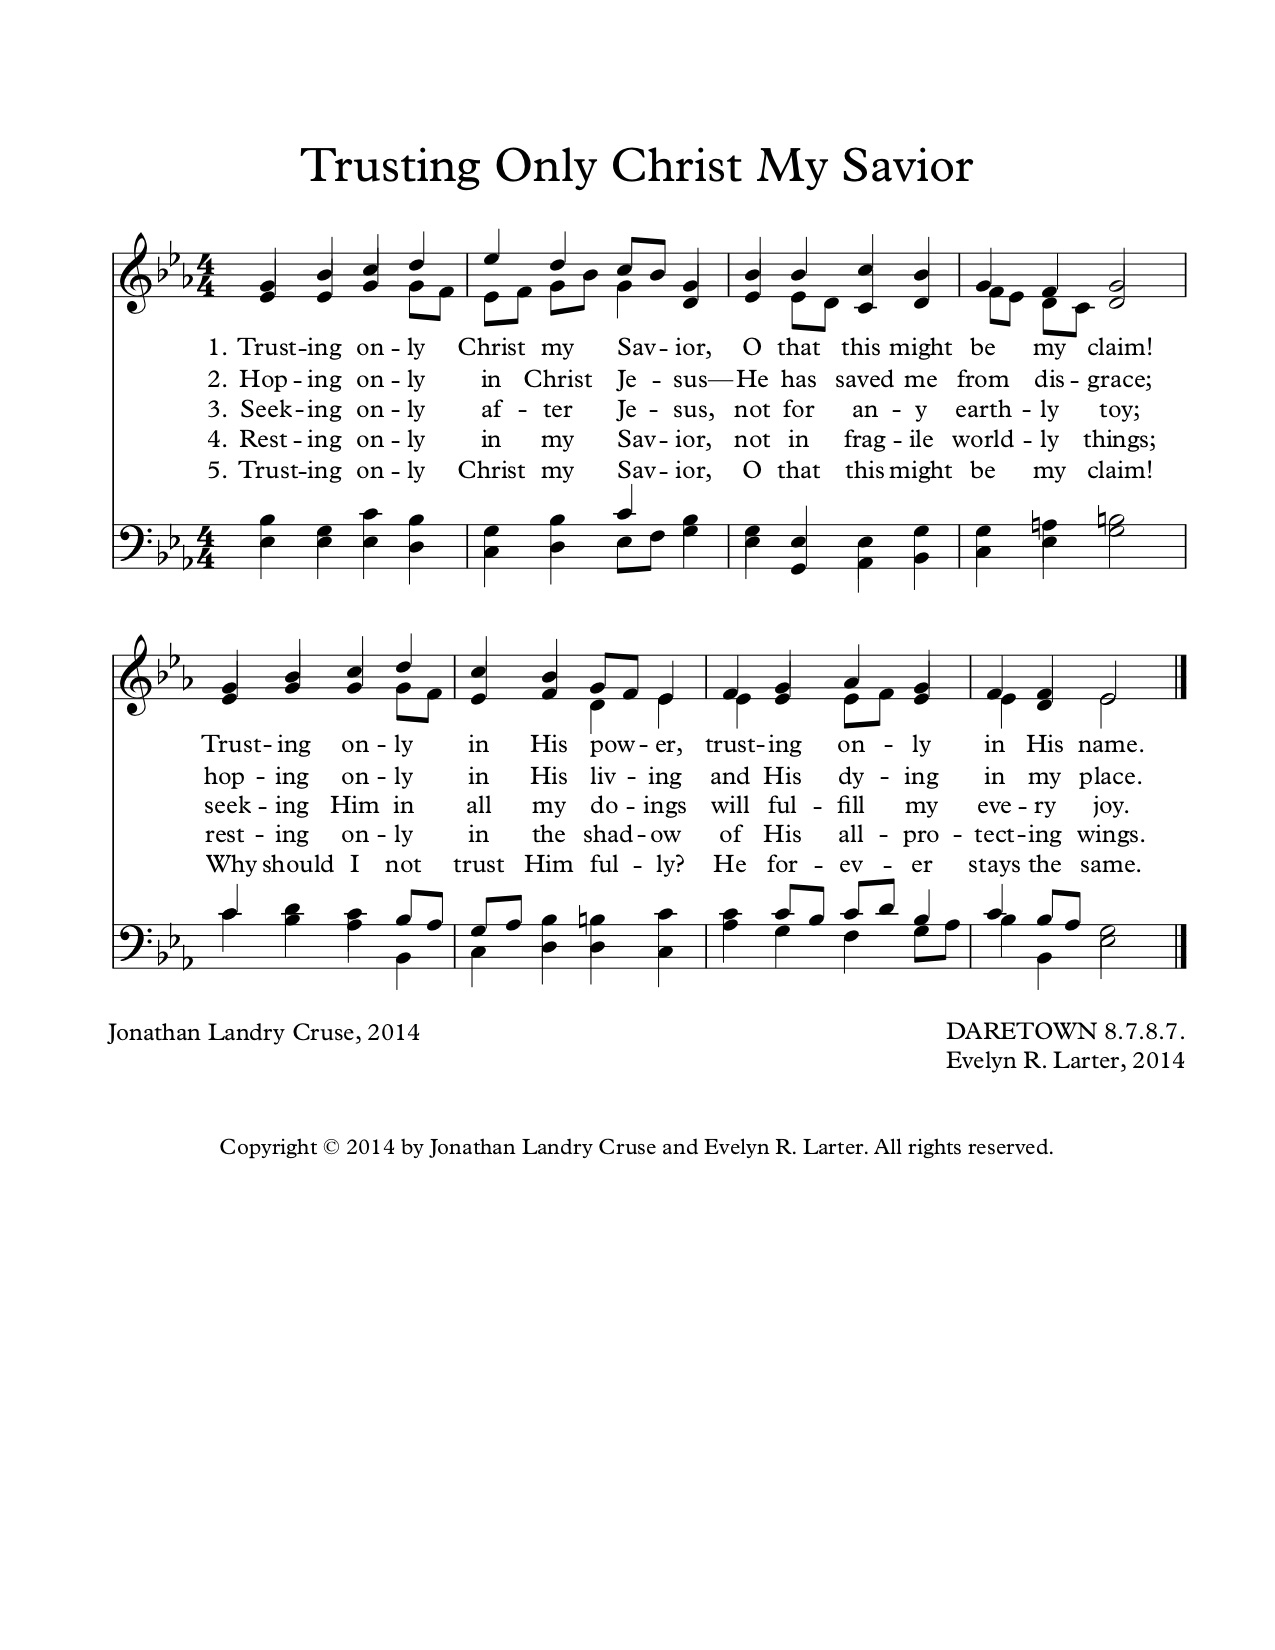 Trusting Only Christ My Savior (DARETOWN)CL1.jpg